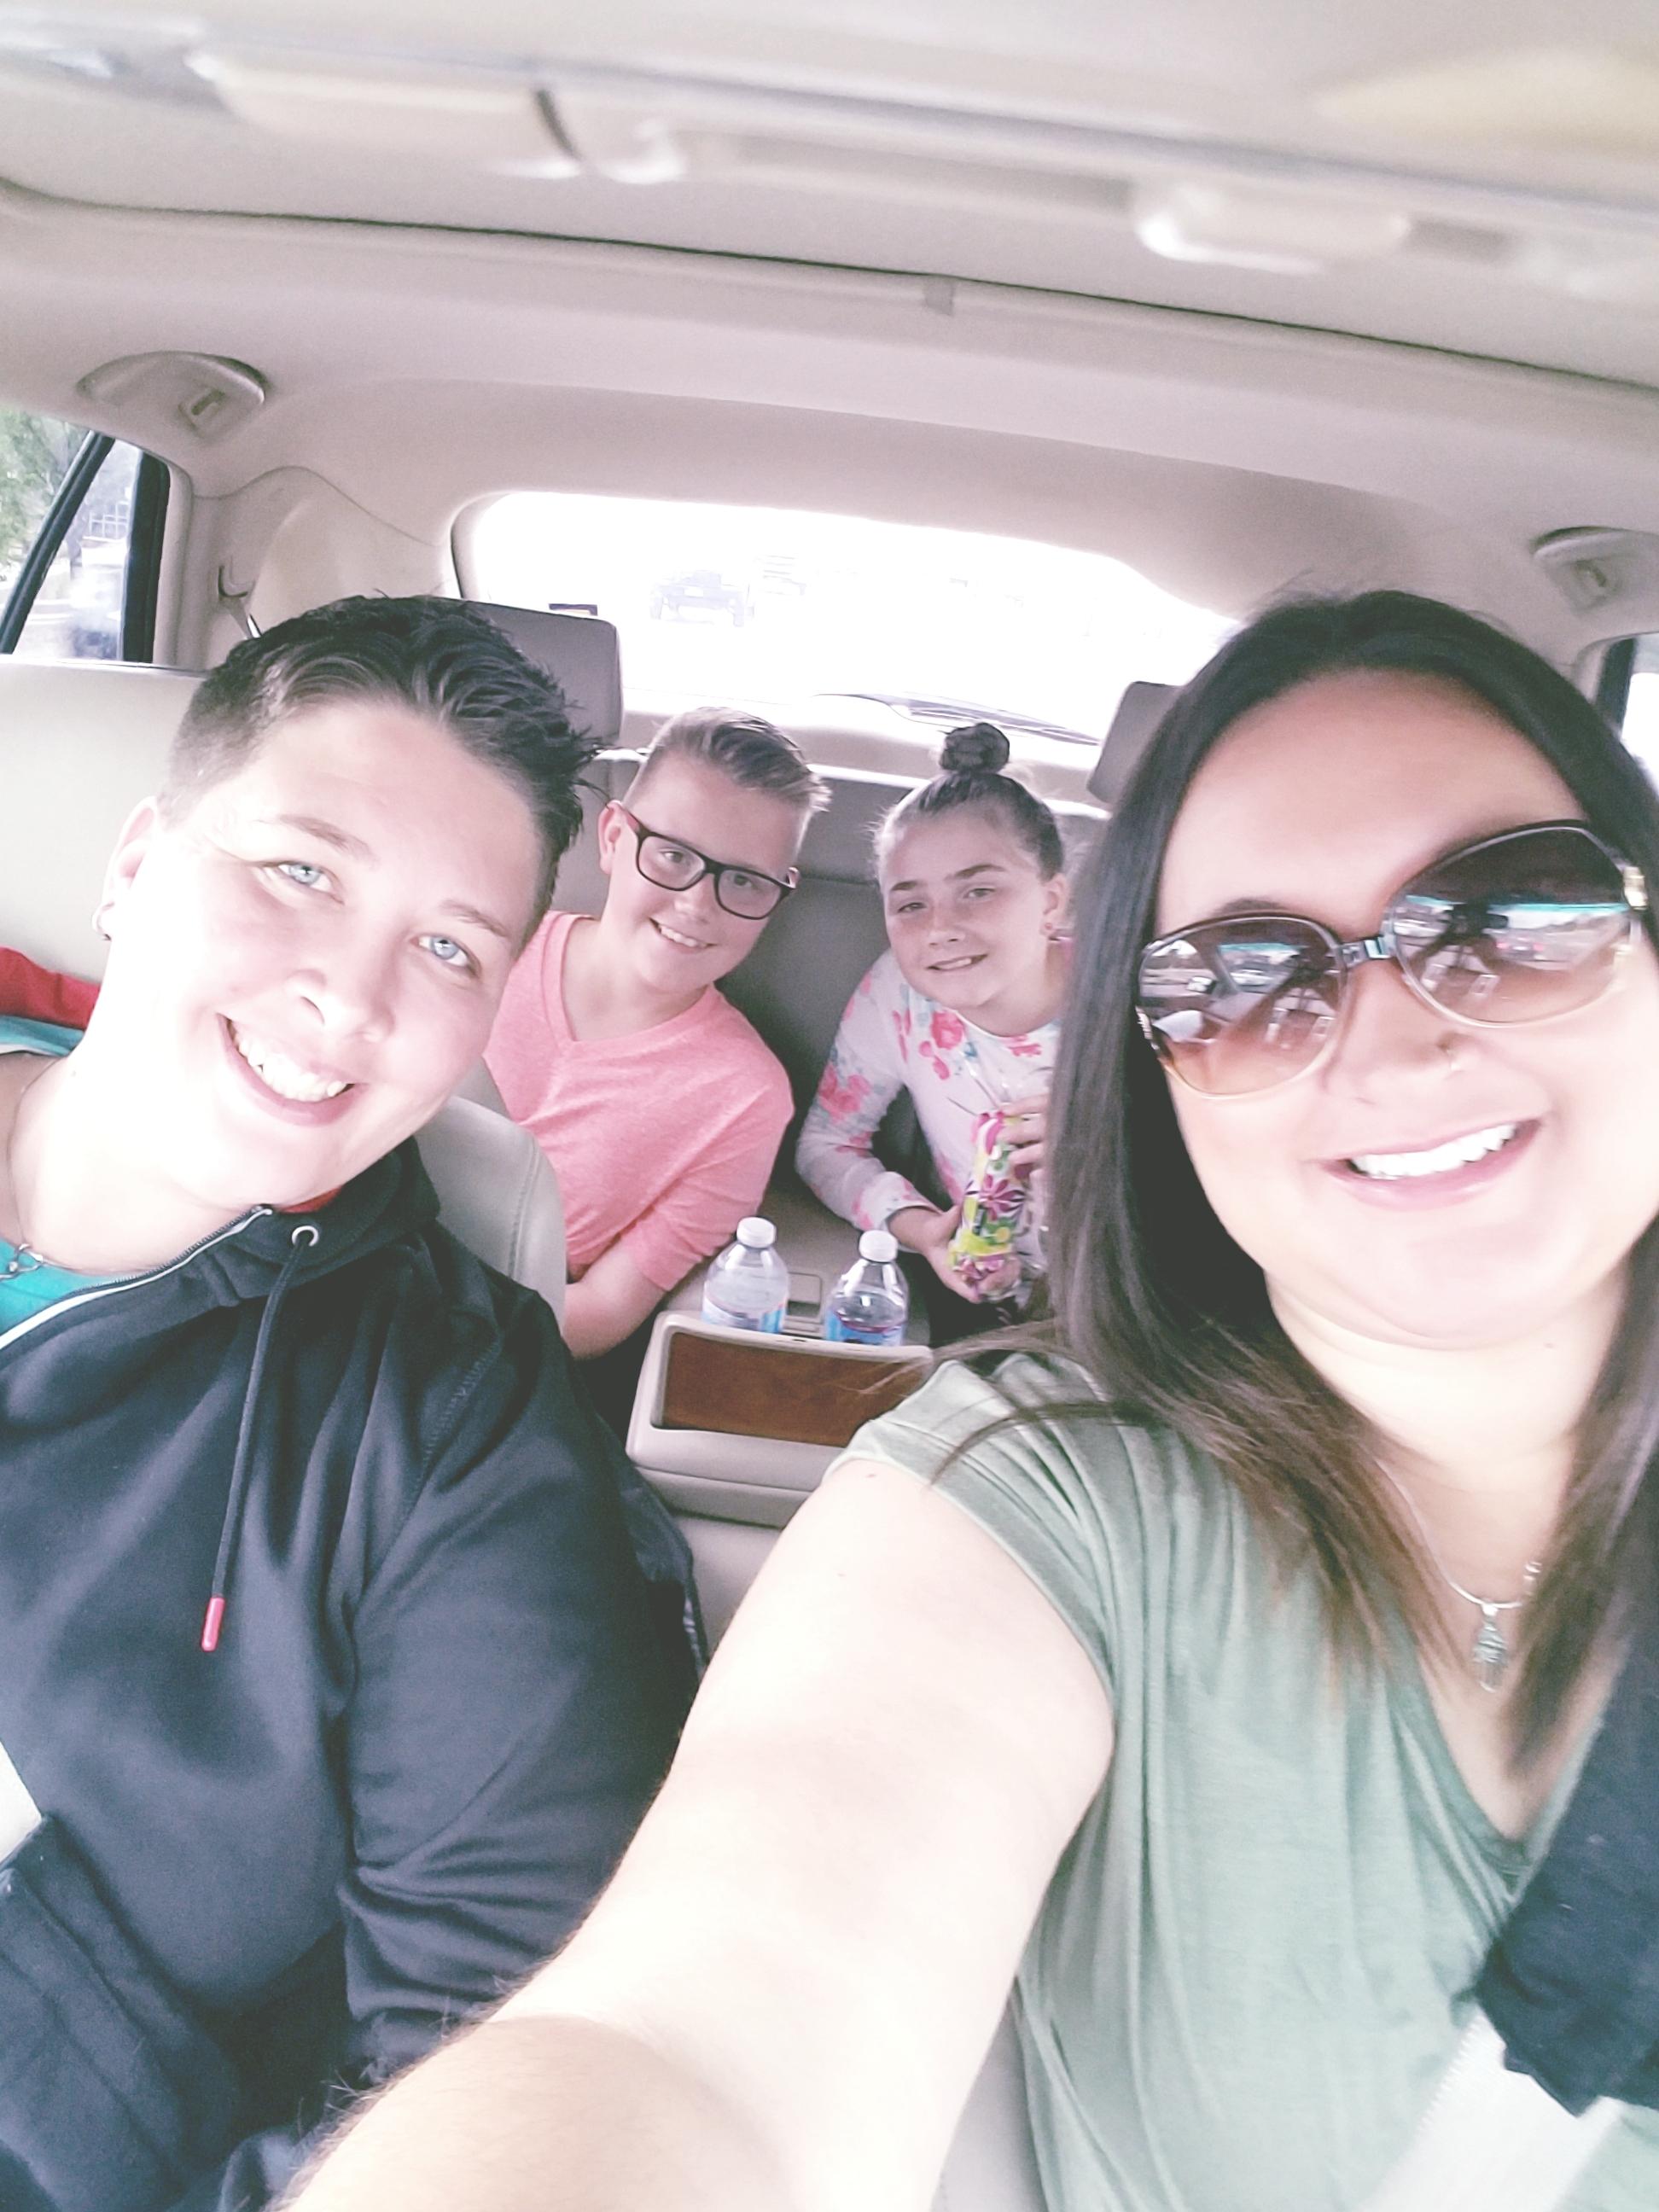 Stephanie & Marcette, with James & Trynity